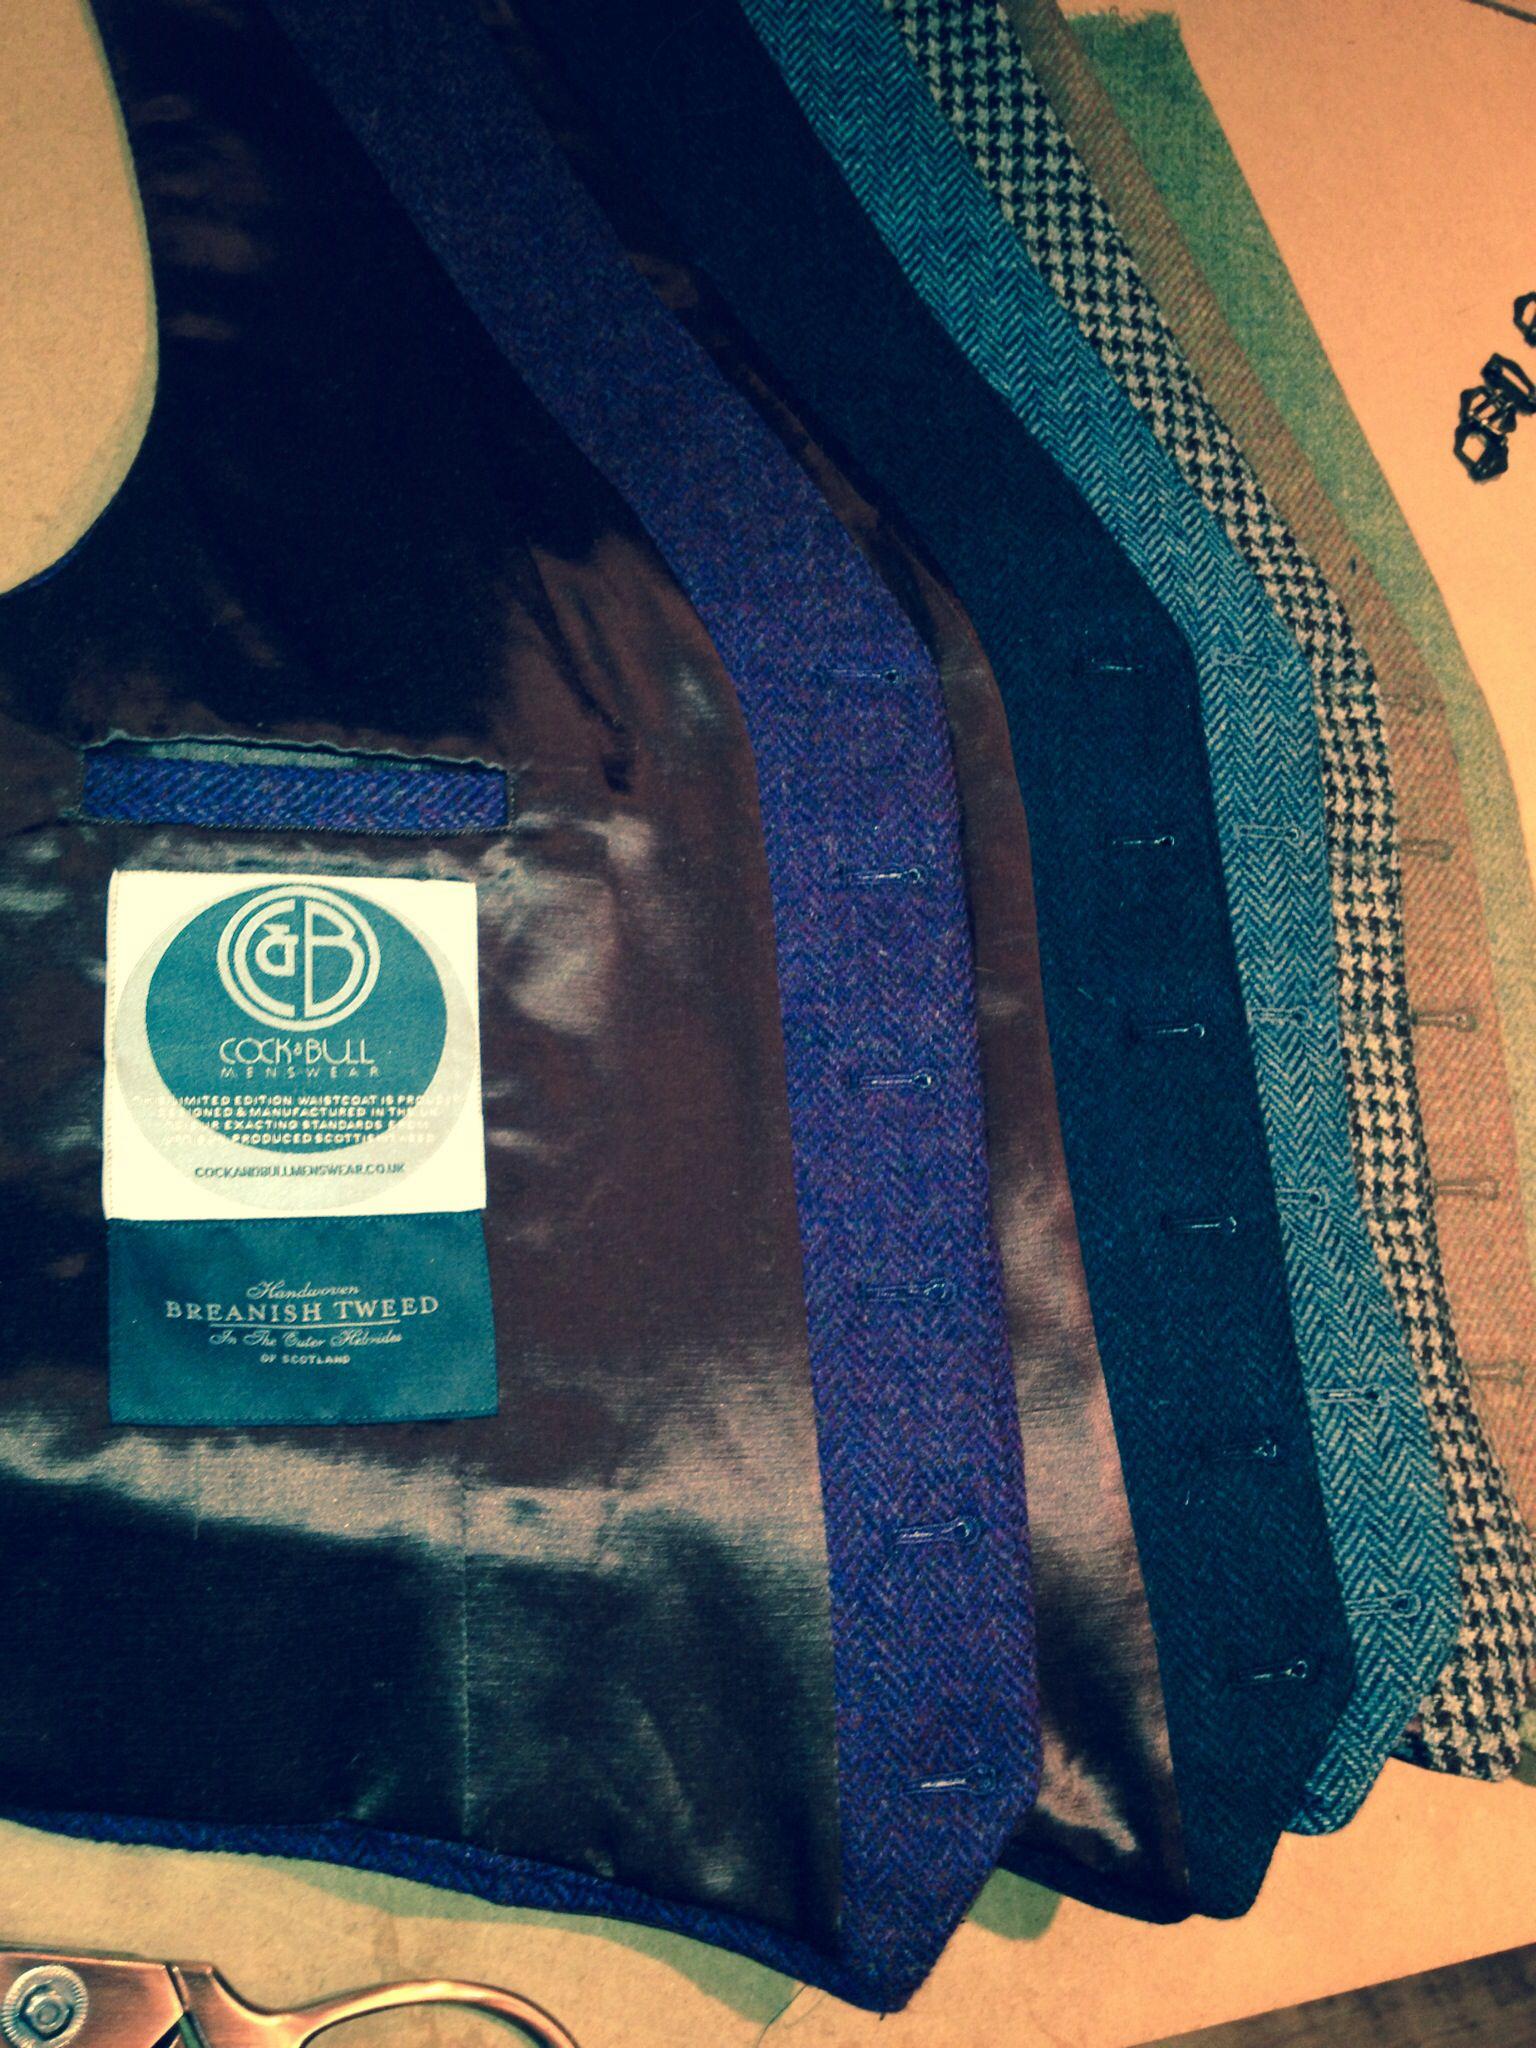 Hand-woven Scottish Tweed waistcoats